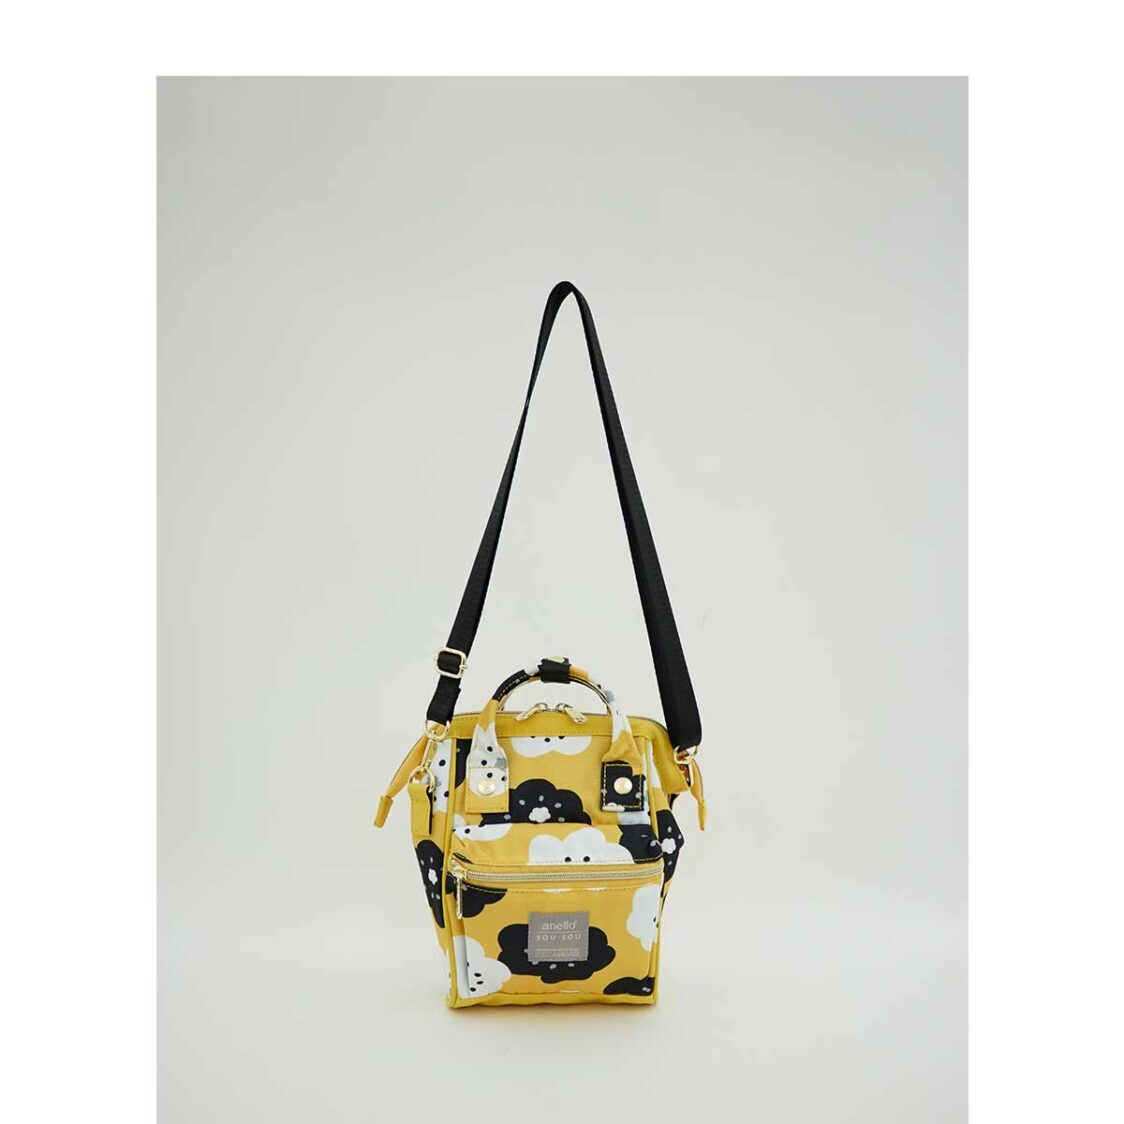 Anello X SousouT 2Way Micro Shoulder Bag Yellow